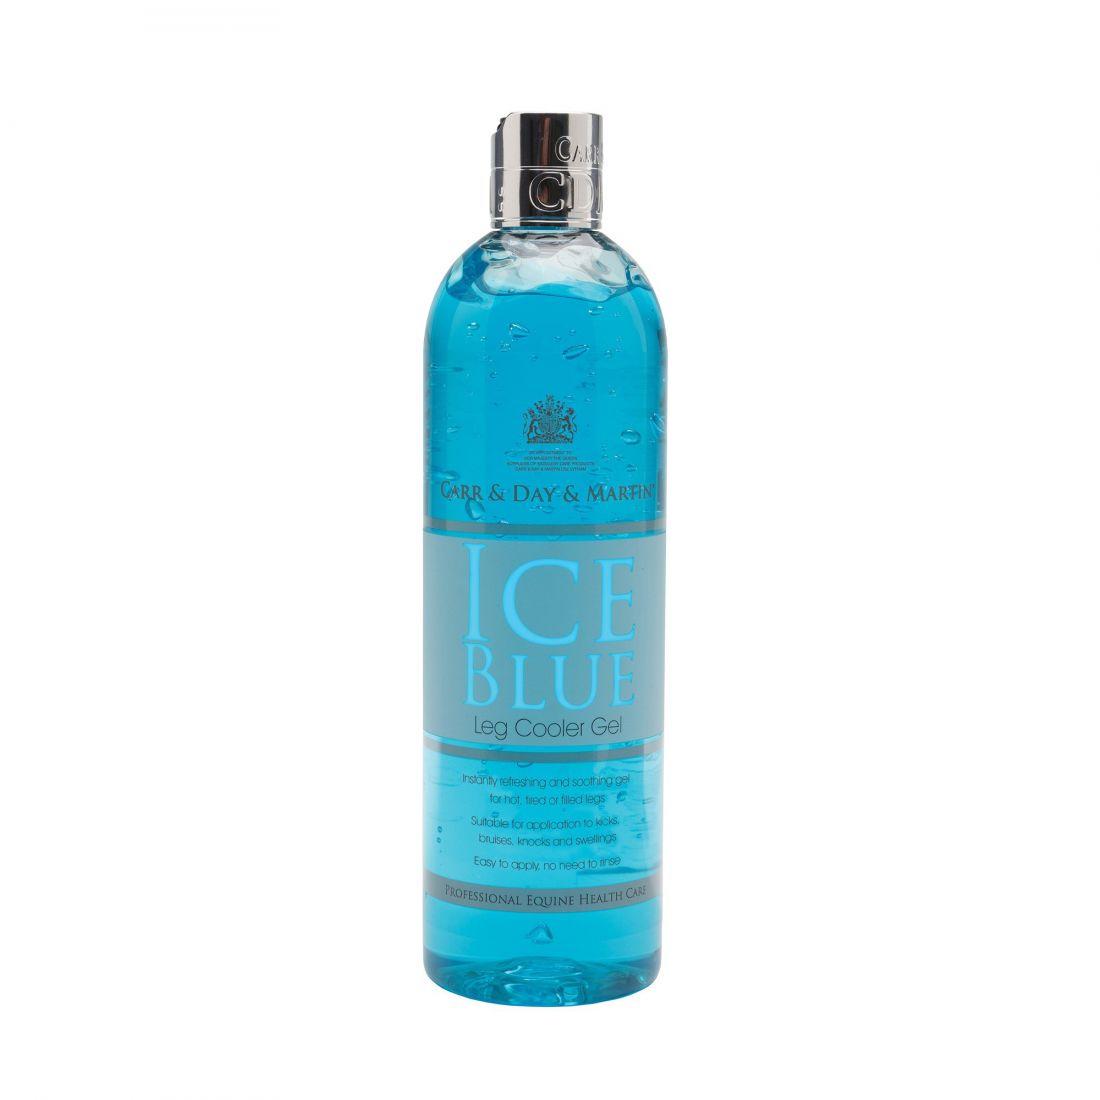 Ice Blue Leg Cooler Gel (Охлаждающий гель)